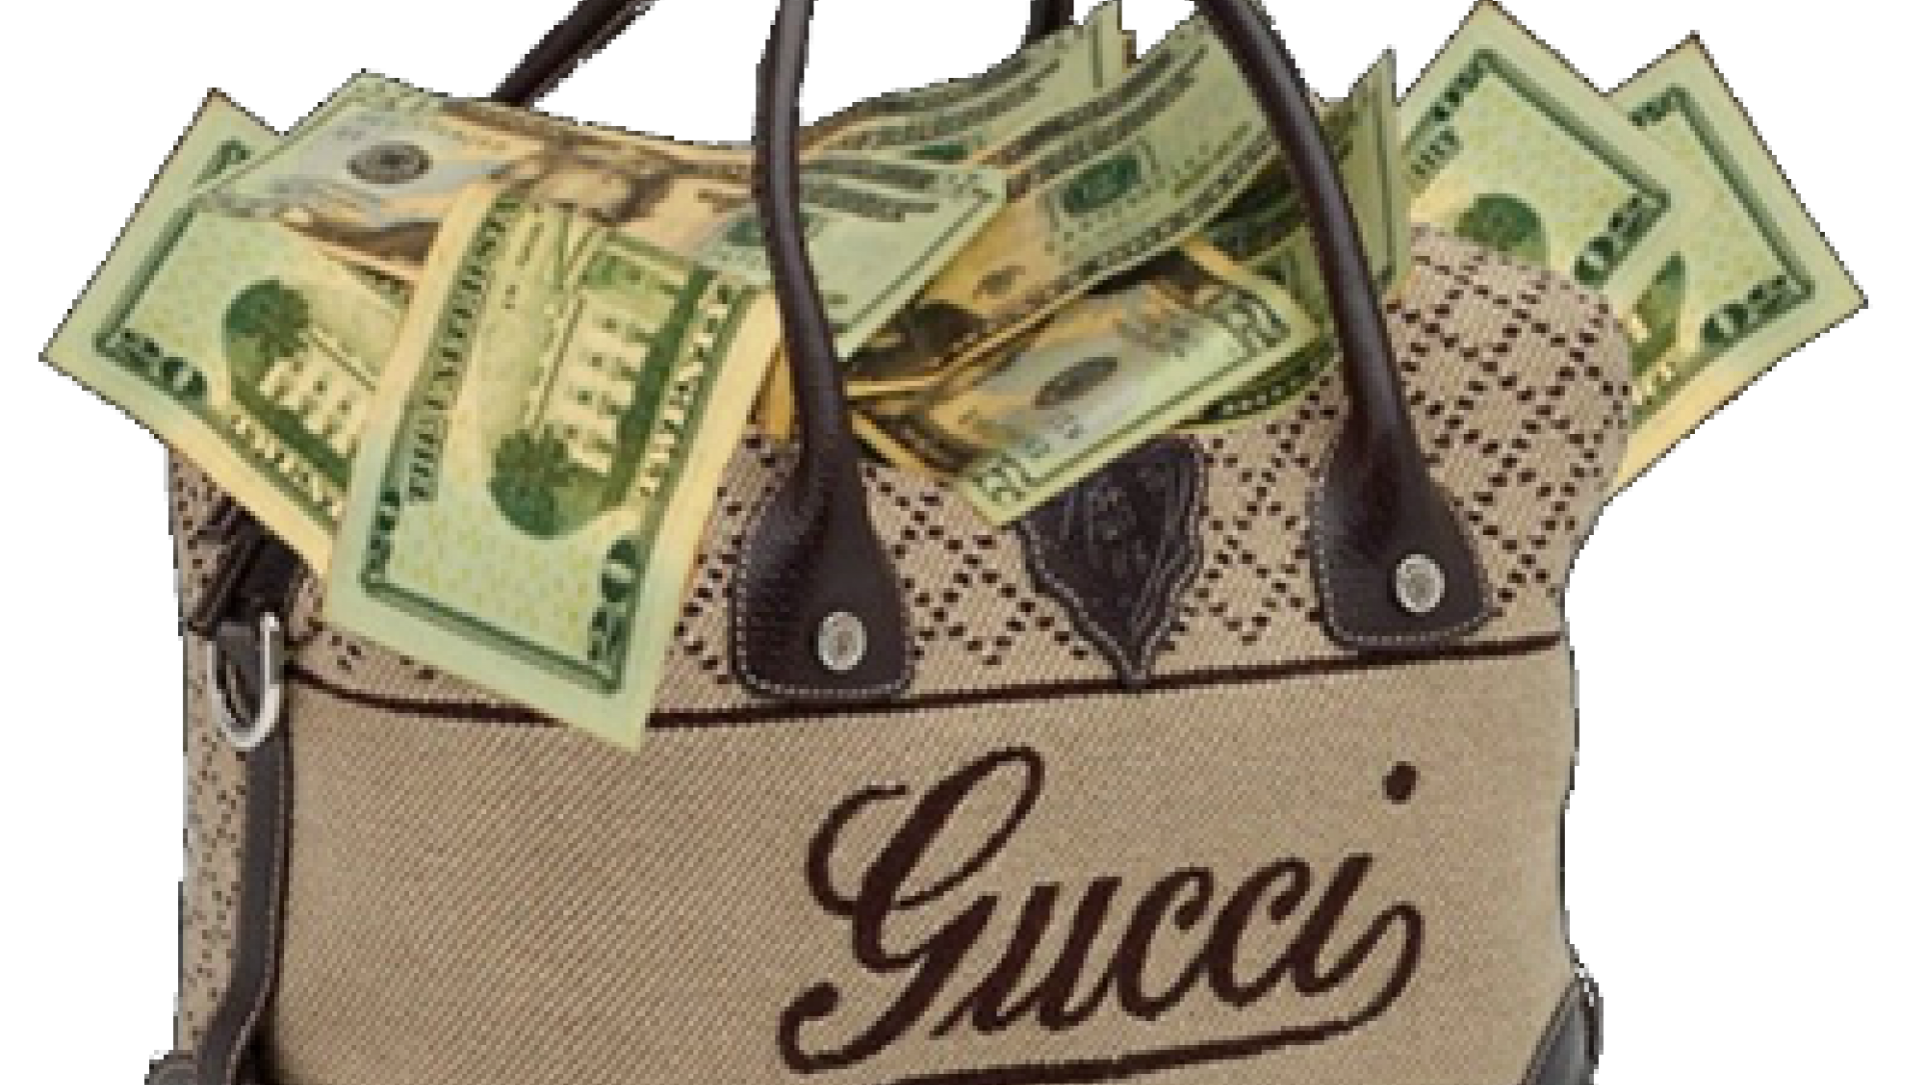 Gucci Money bag Fashion.